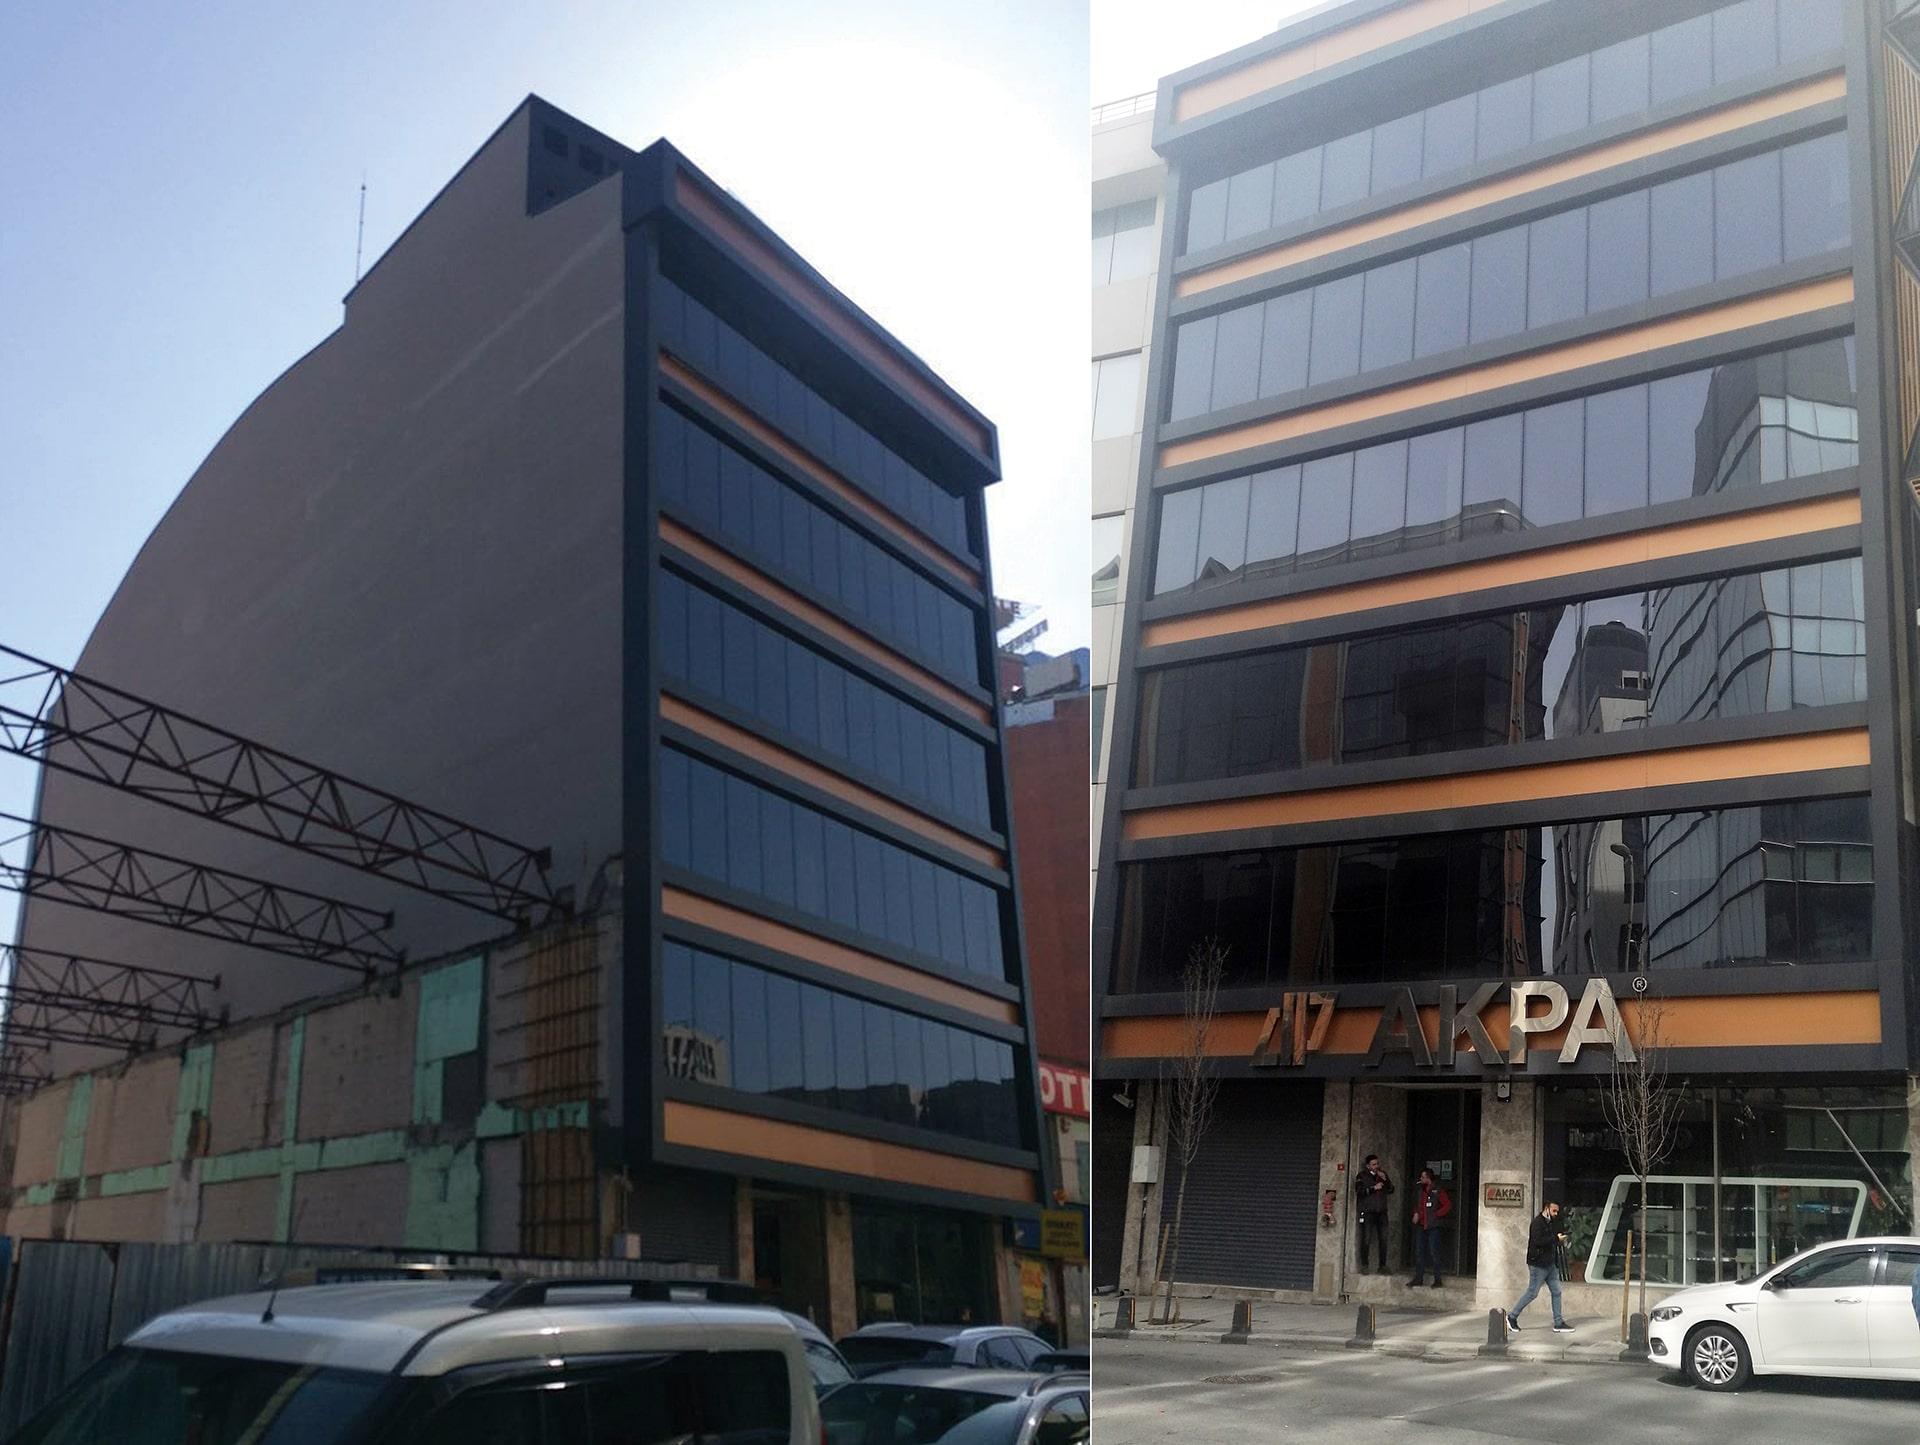 SH-İnşaat-akpa-plaza-1